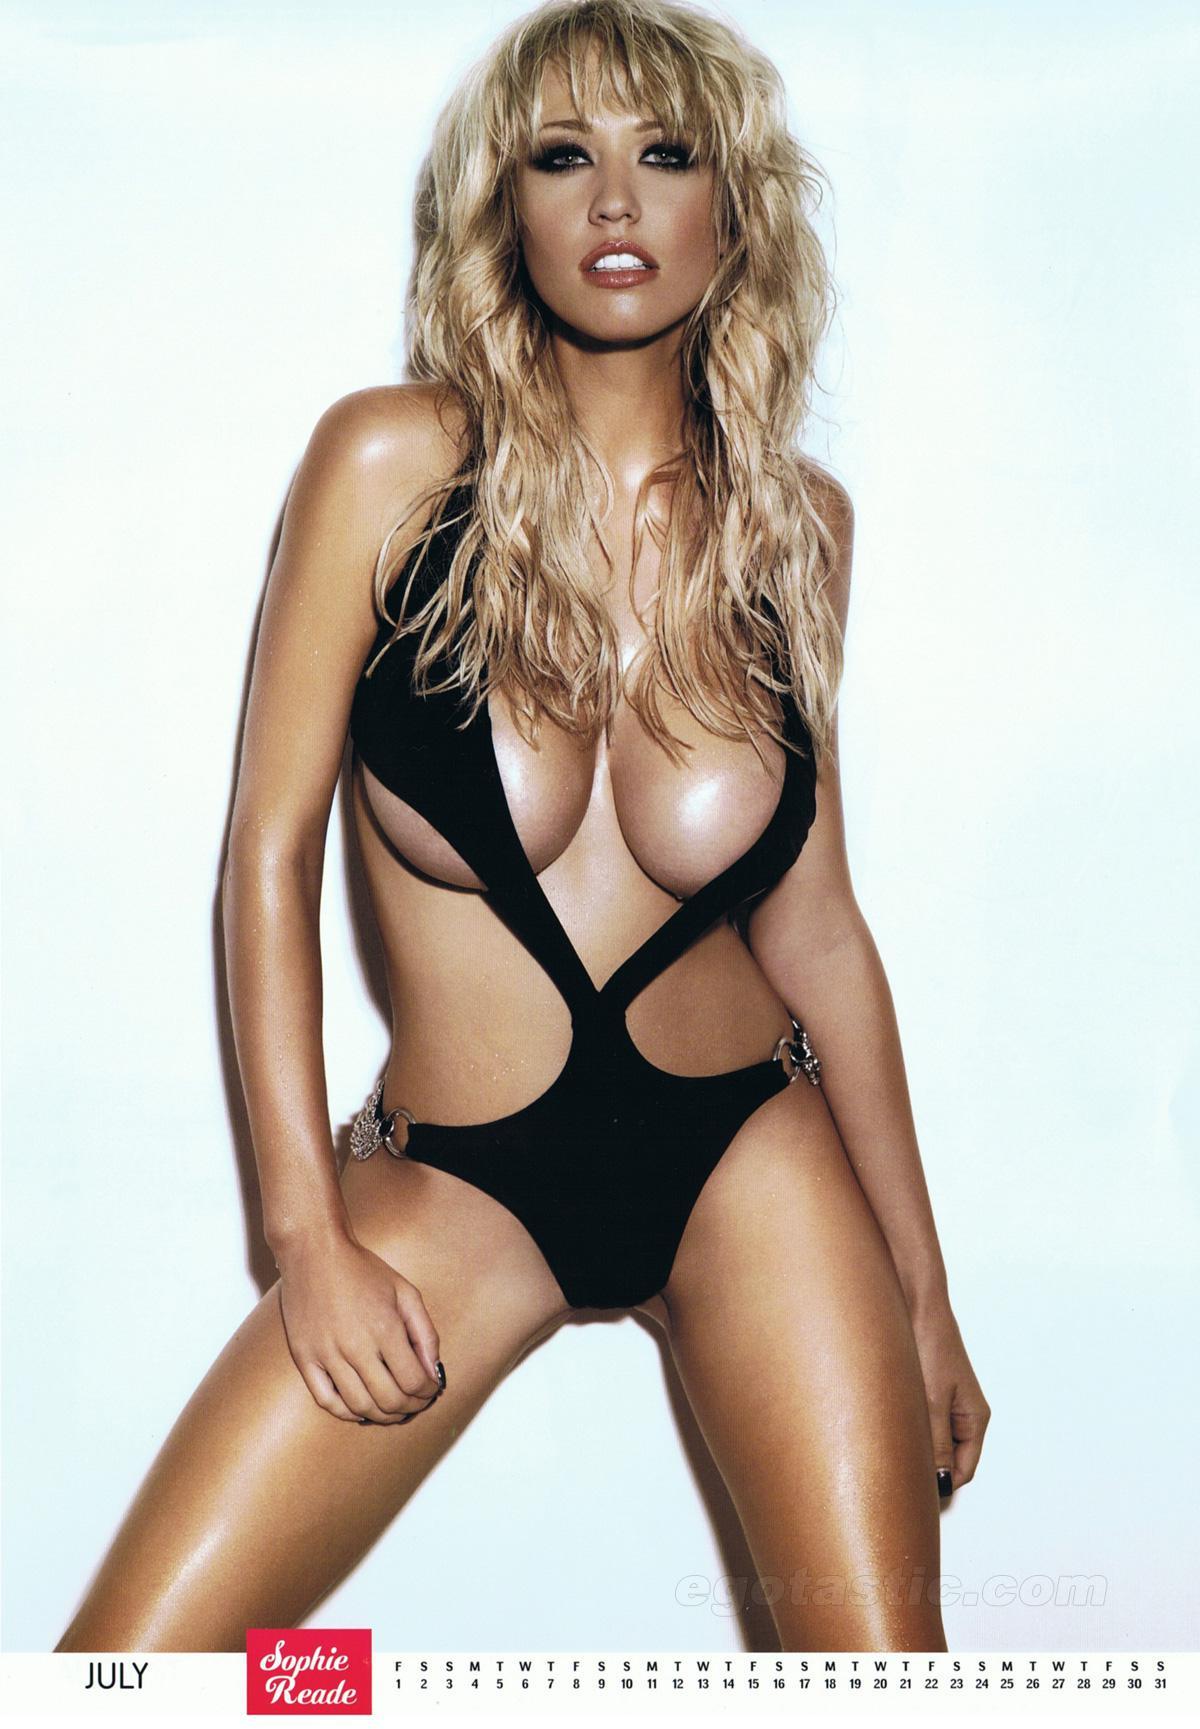 Sophie Reade fotos desnuda